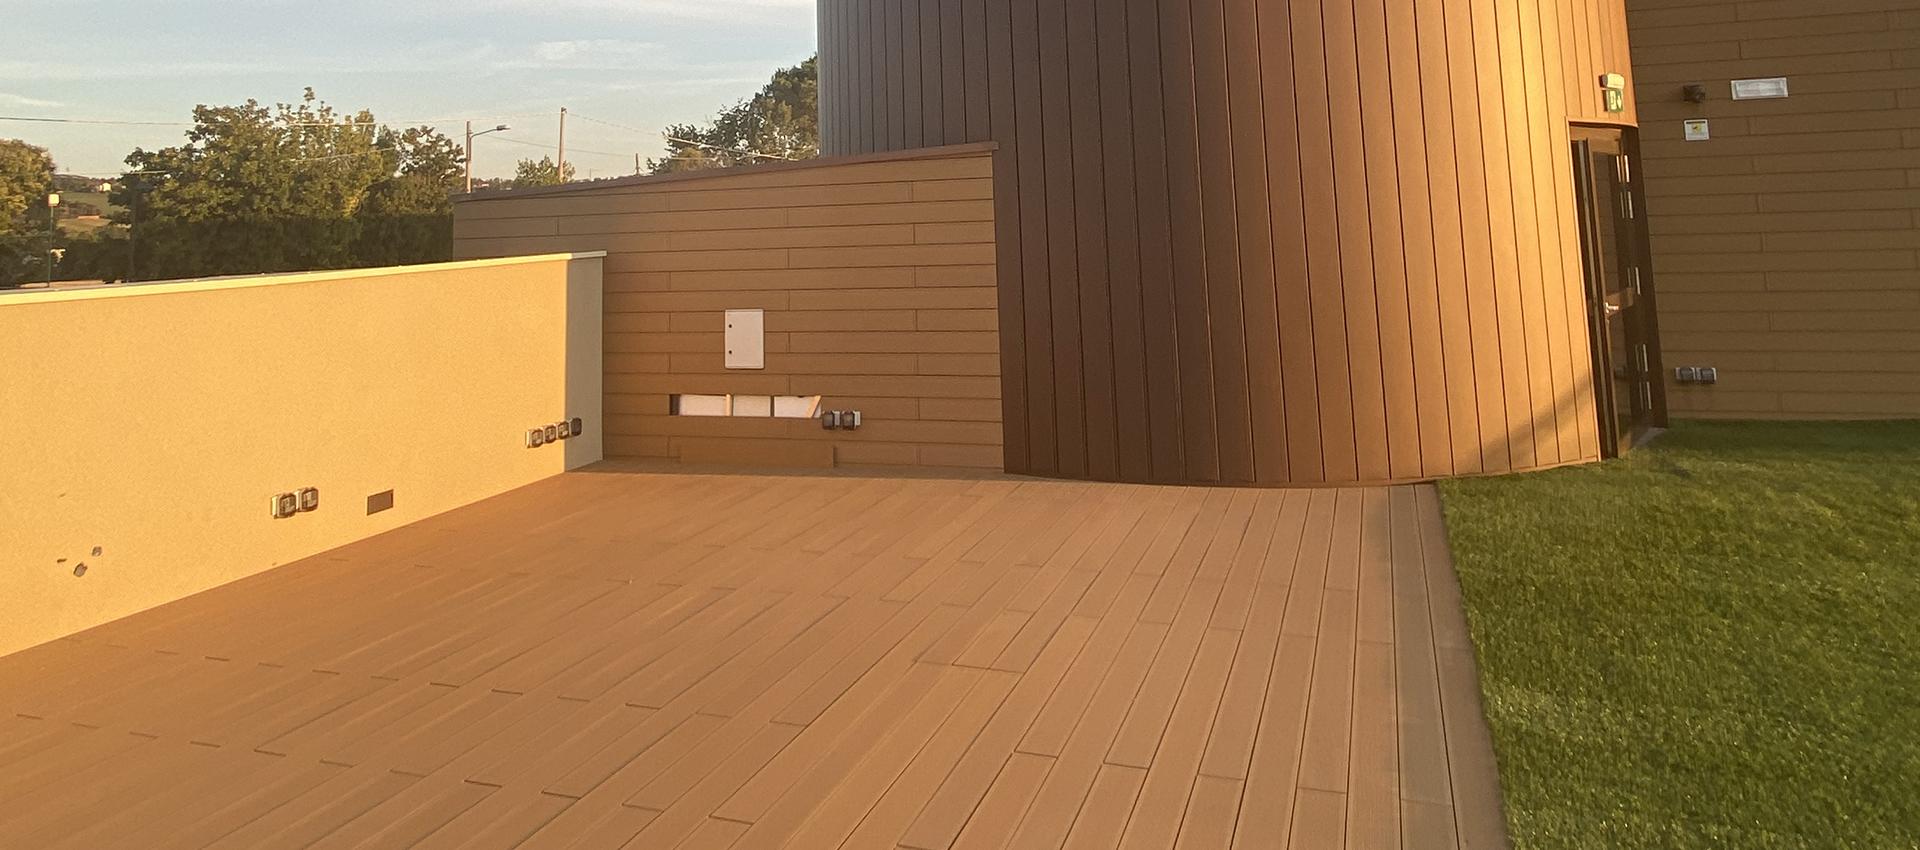 https://dakotaliving.eu/wp-content/uploads/2020/09/Dakota-living-baldoria-rimini-solid-sand-light-gold-1.jpg